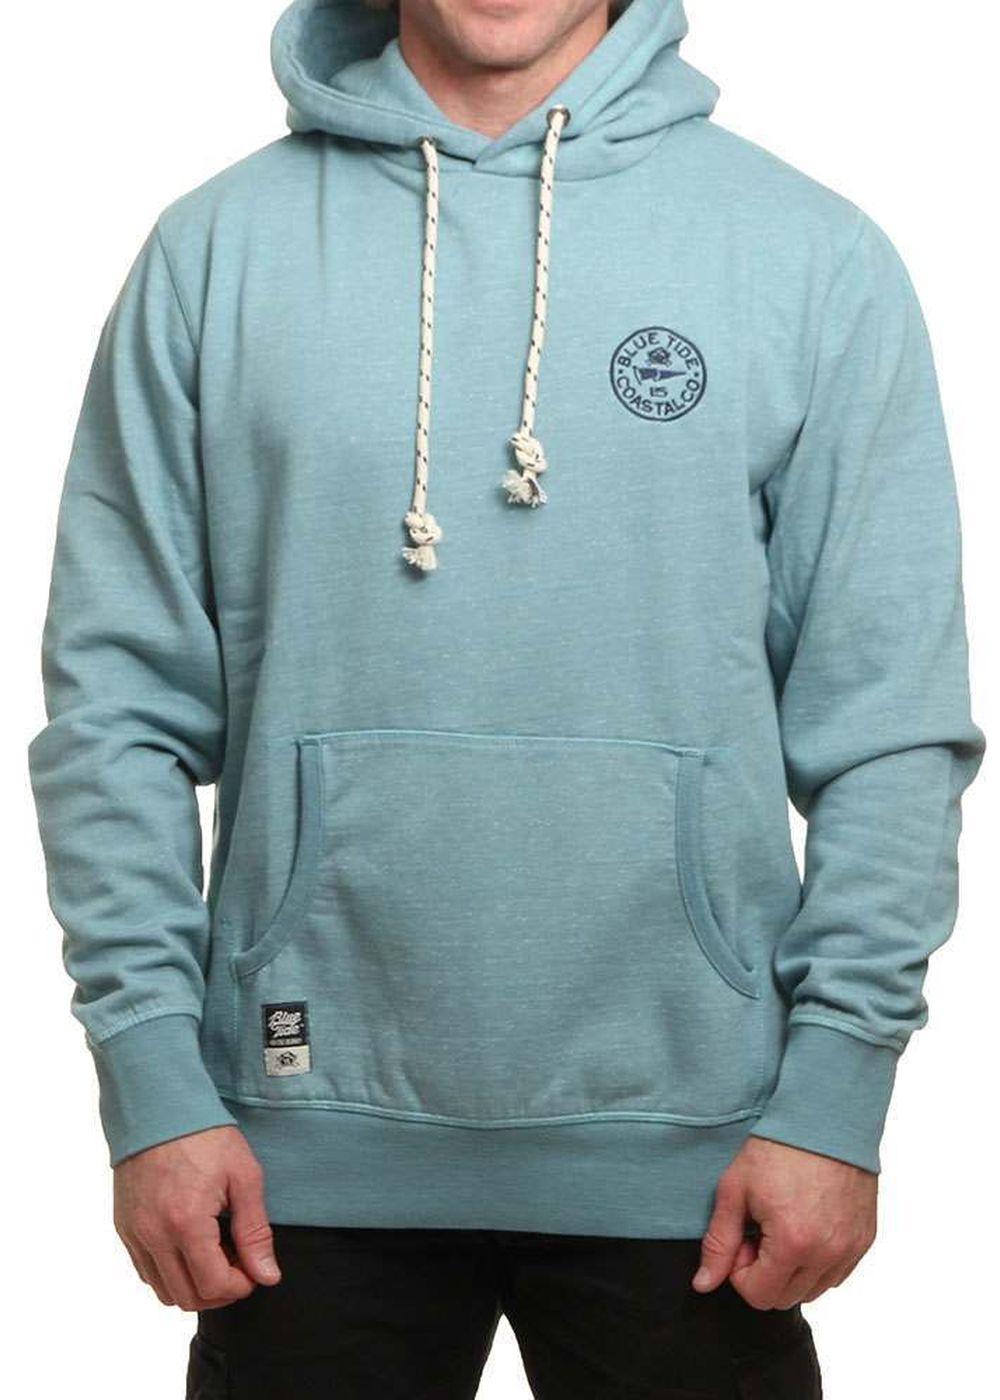 blue tide fleck knit hoody arctic